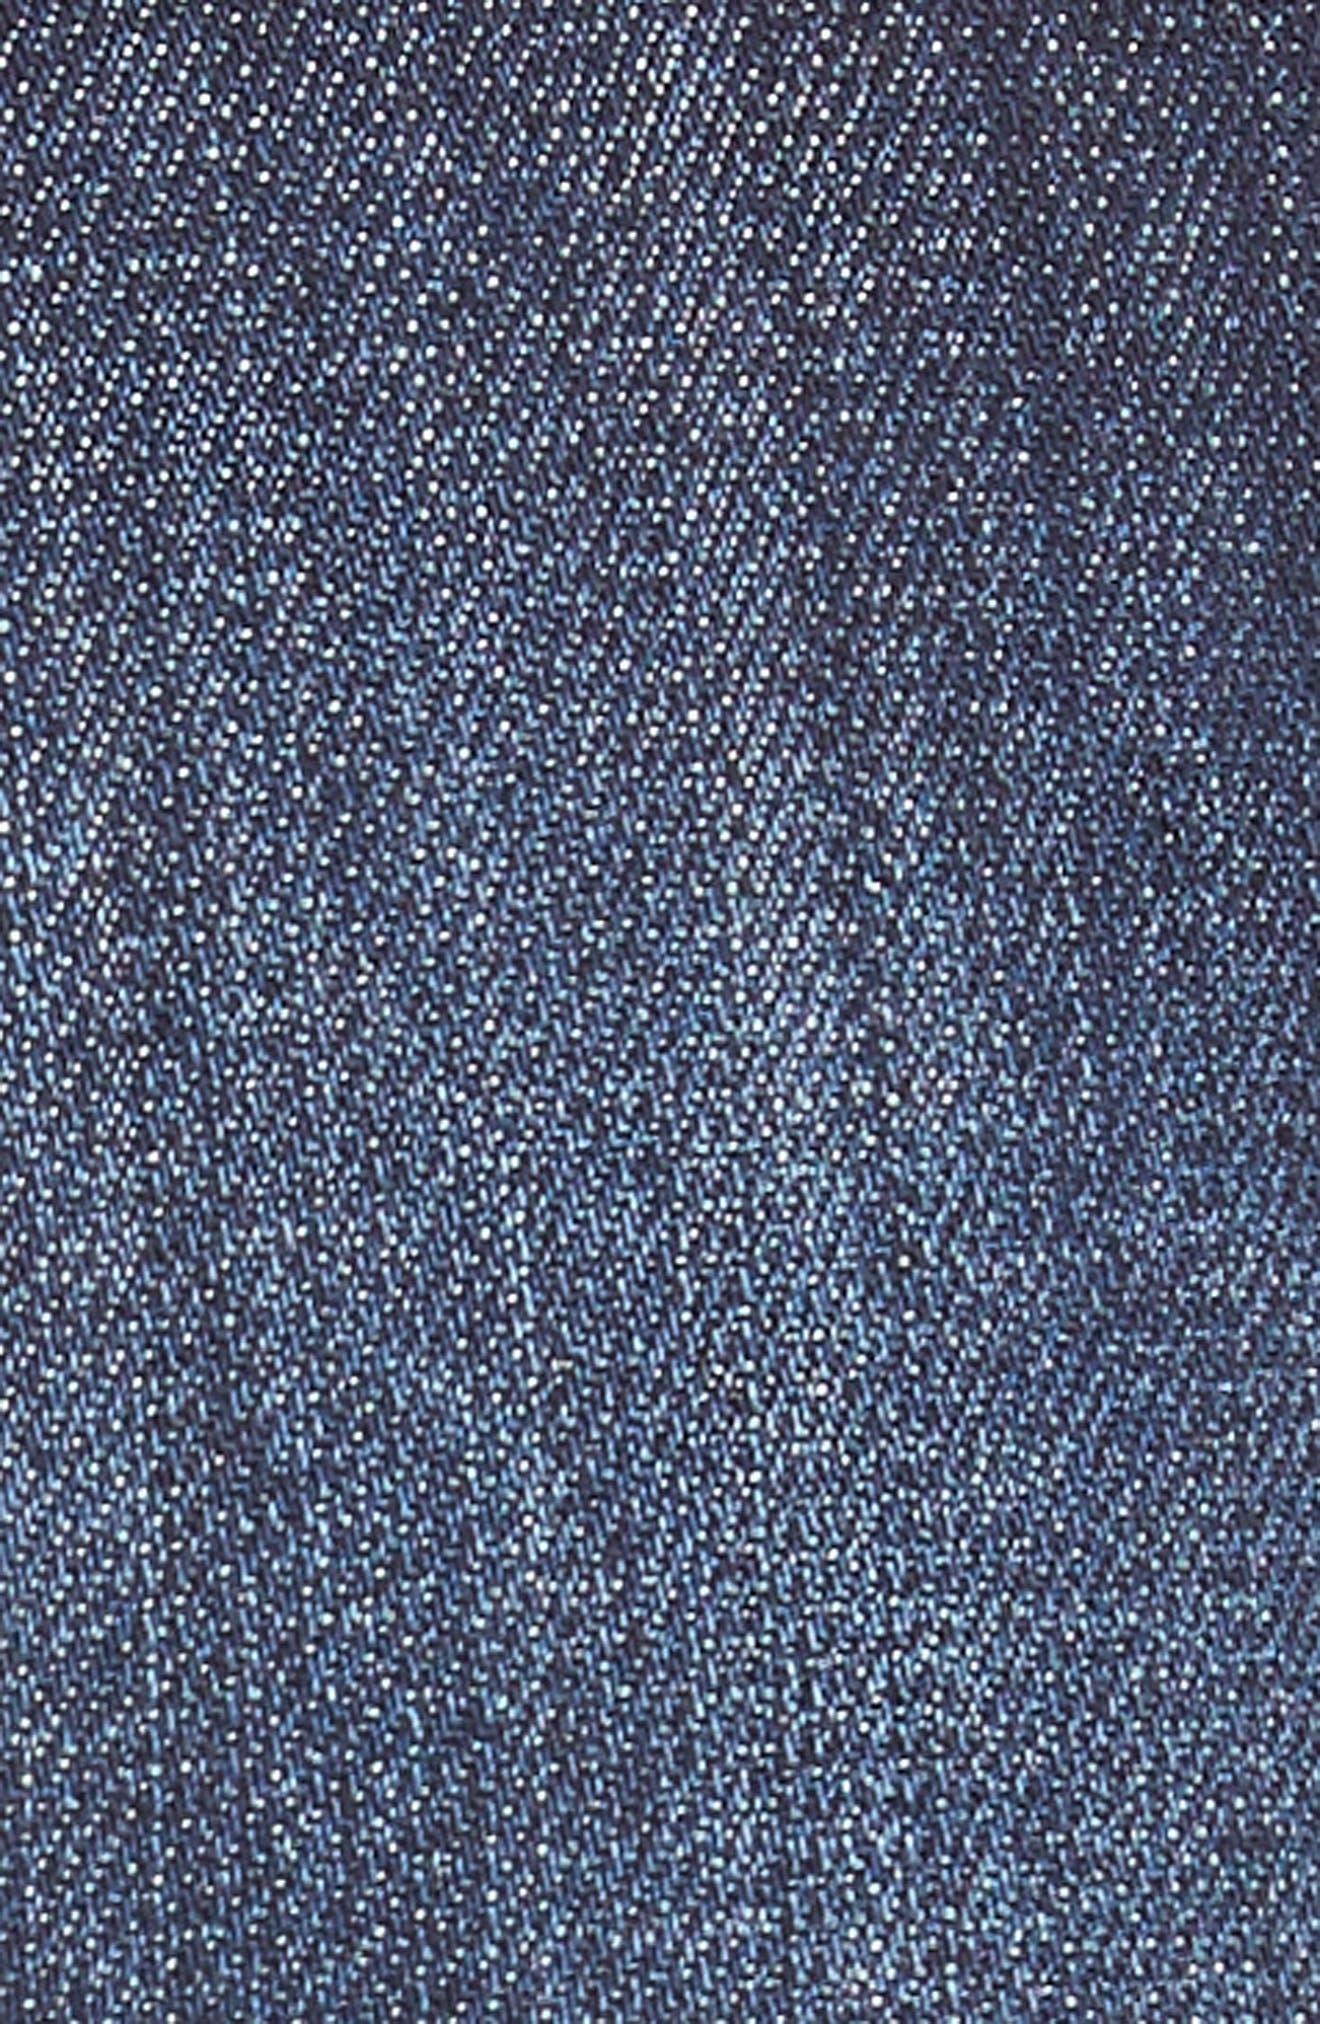 Gidget Denim Cutoff Shorts,                             Alternate thumbnail 5, color,                             STIMULATING